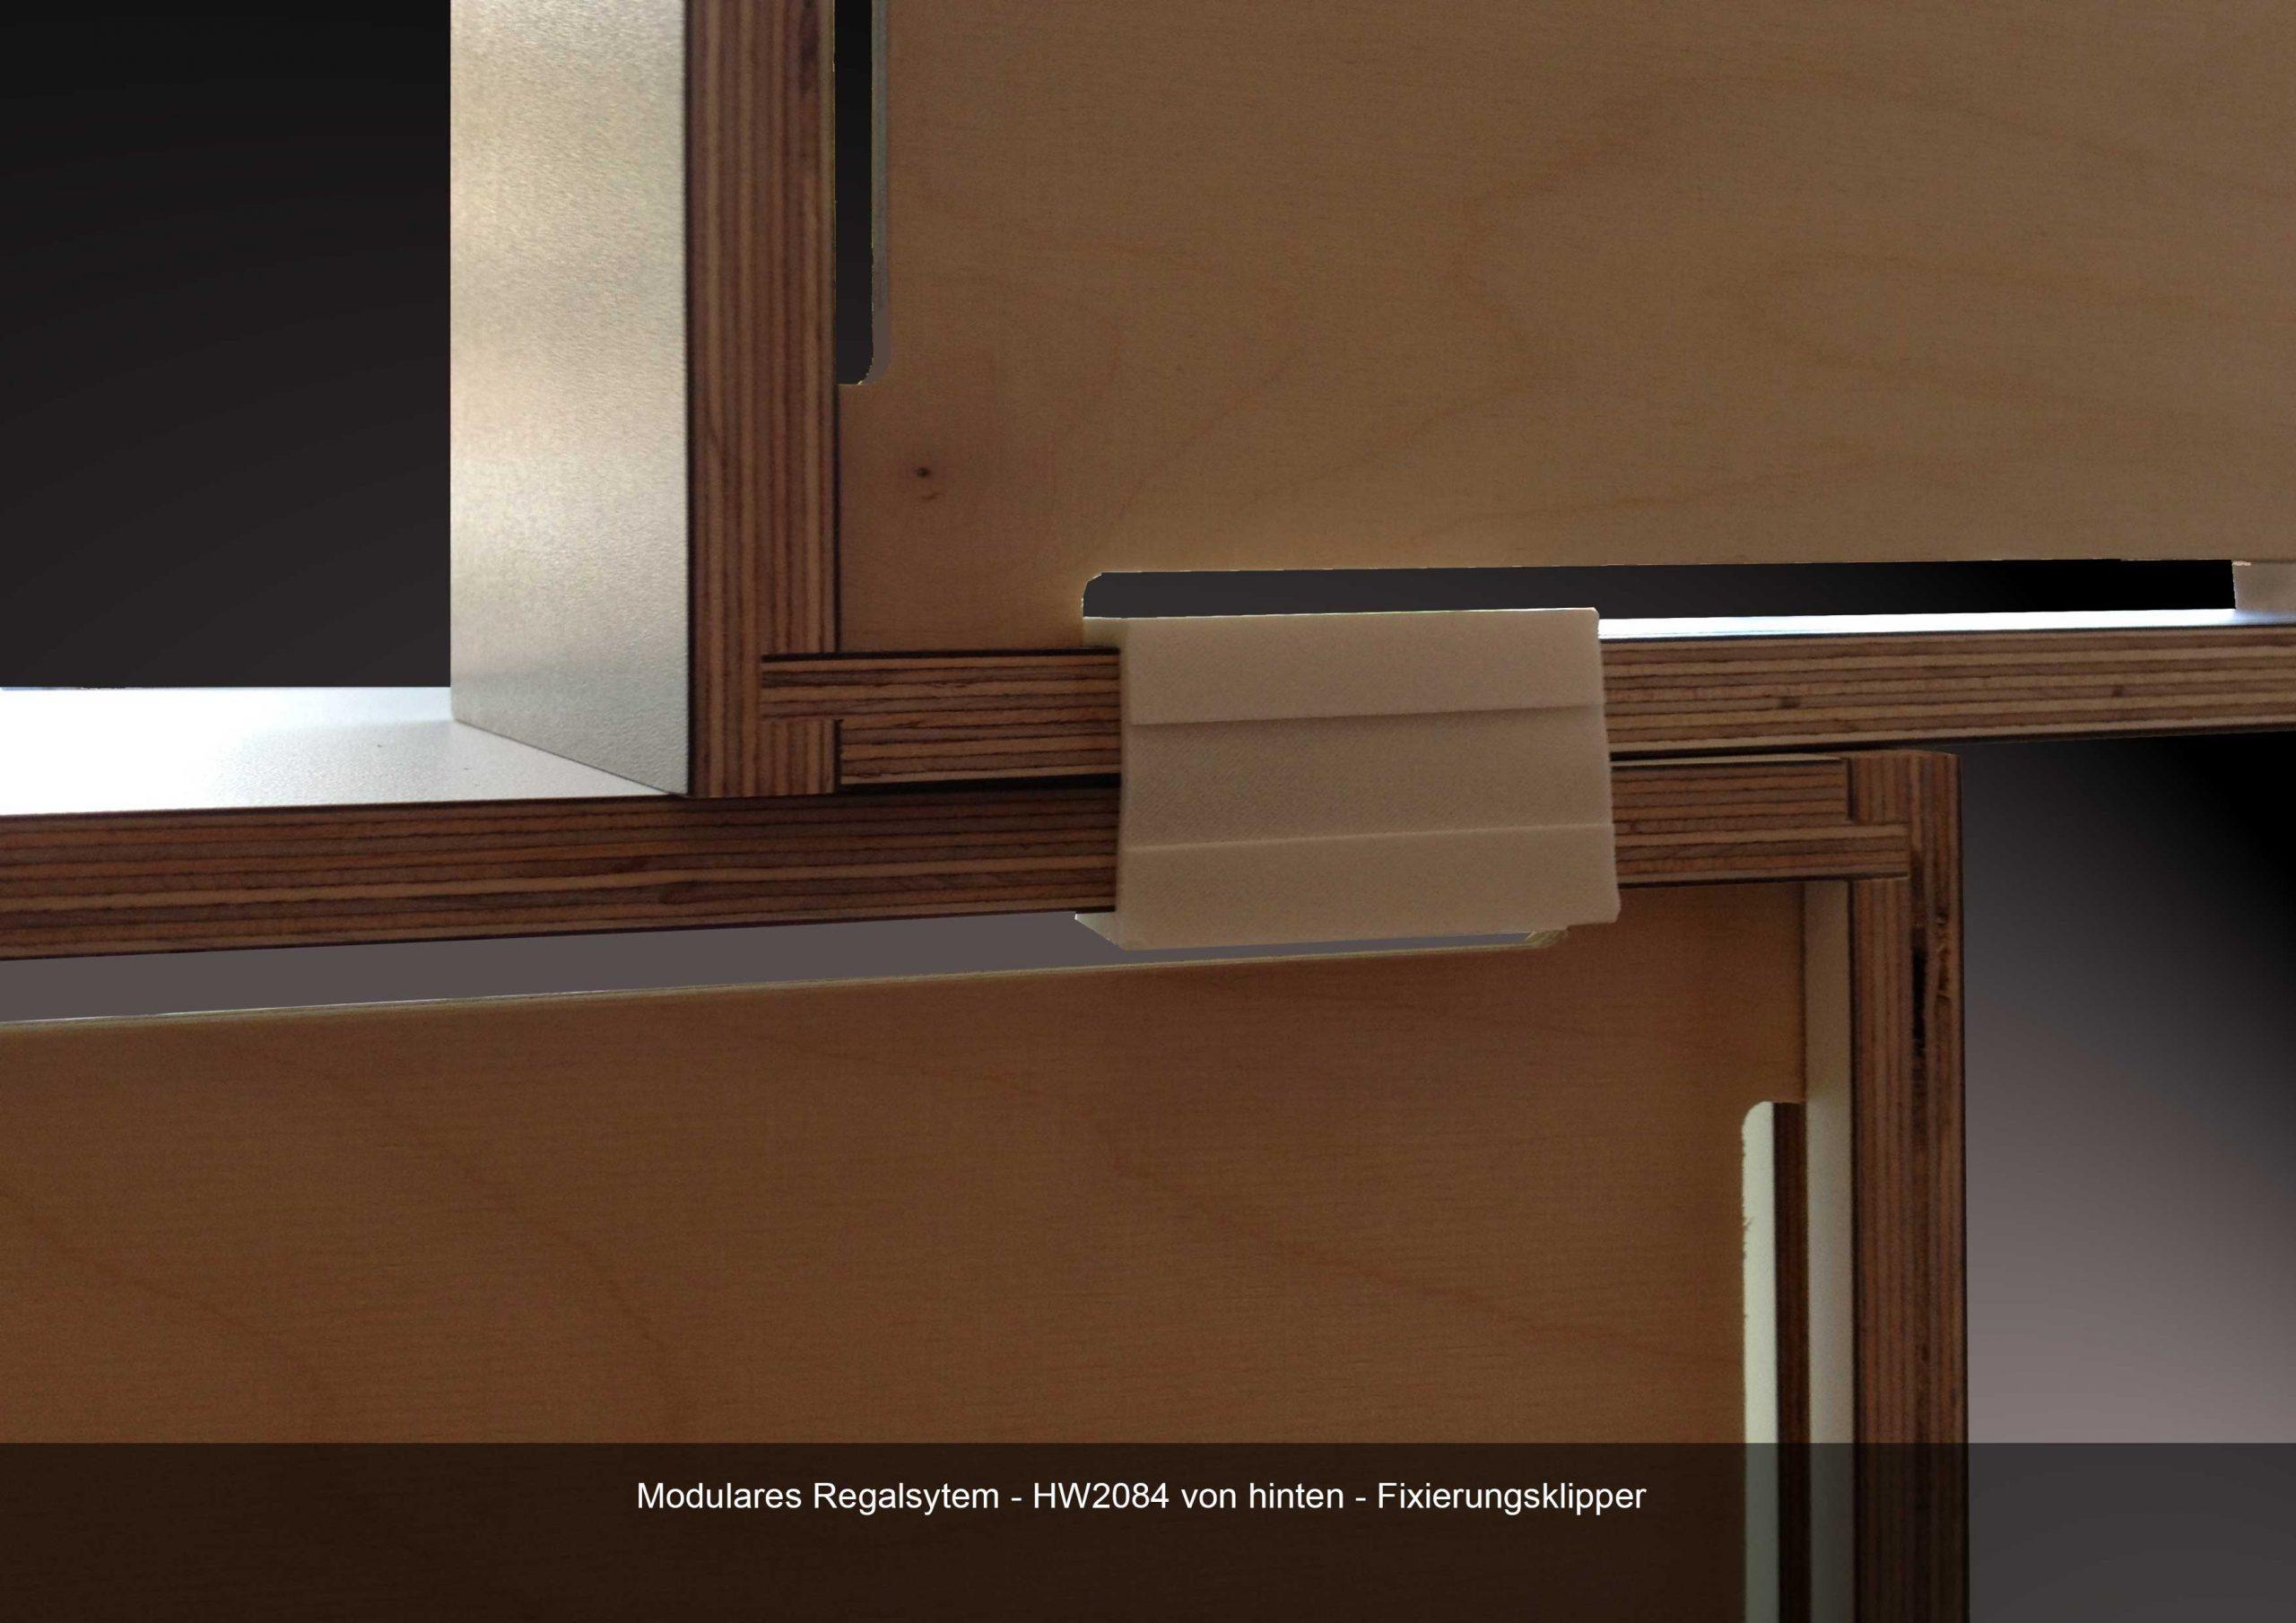 Modulares Regalsystem Fixierung Kliooer HW 2084 Multiplex Birke